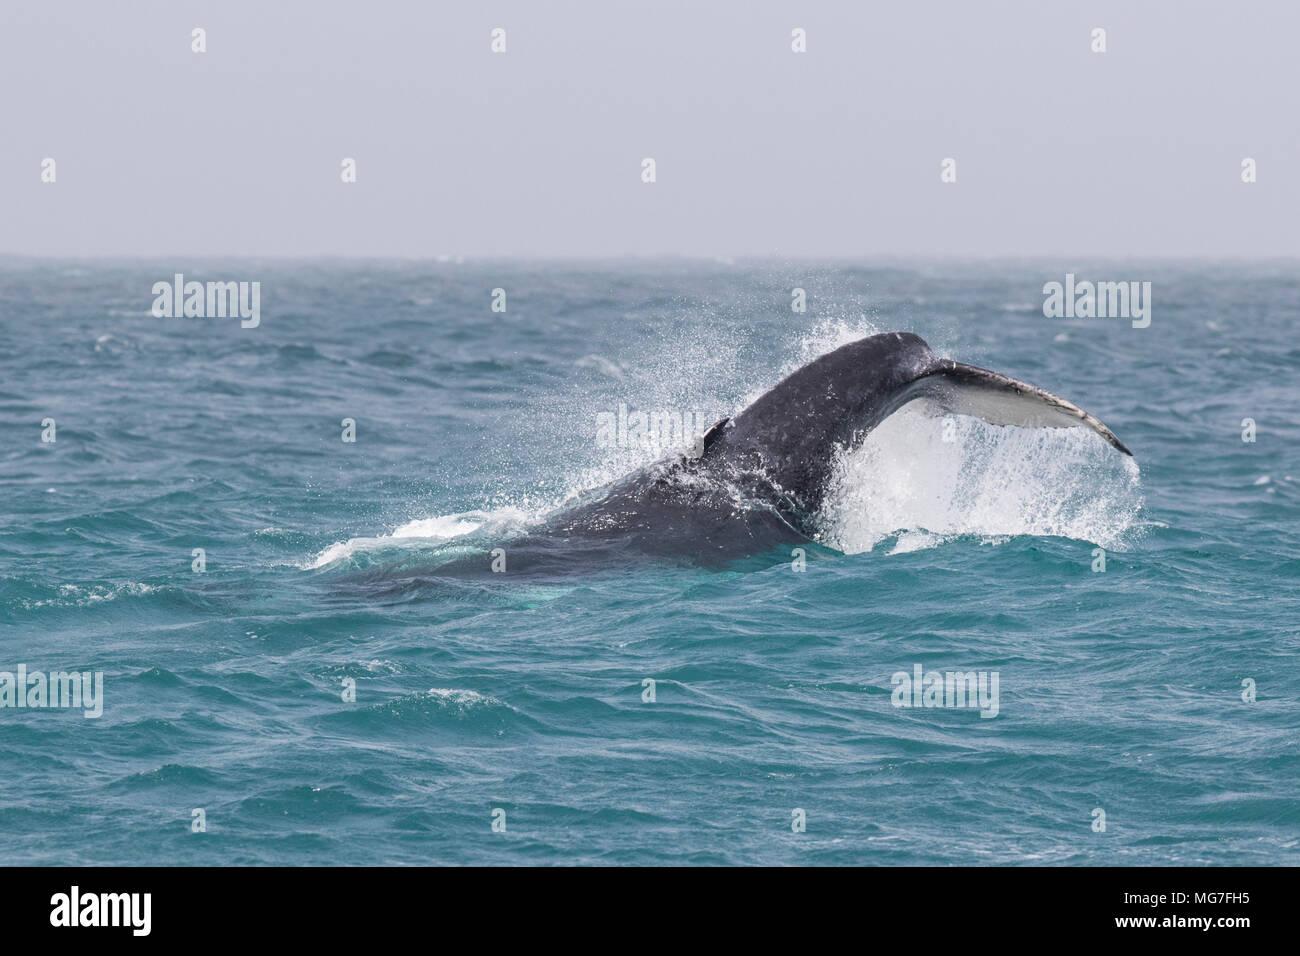 Humpback Whale (Megaptera novaeangliae) calf tail slapping, Boa Vista, Cape Verde - Stock Image